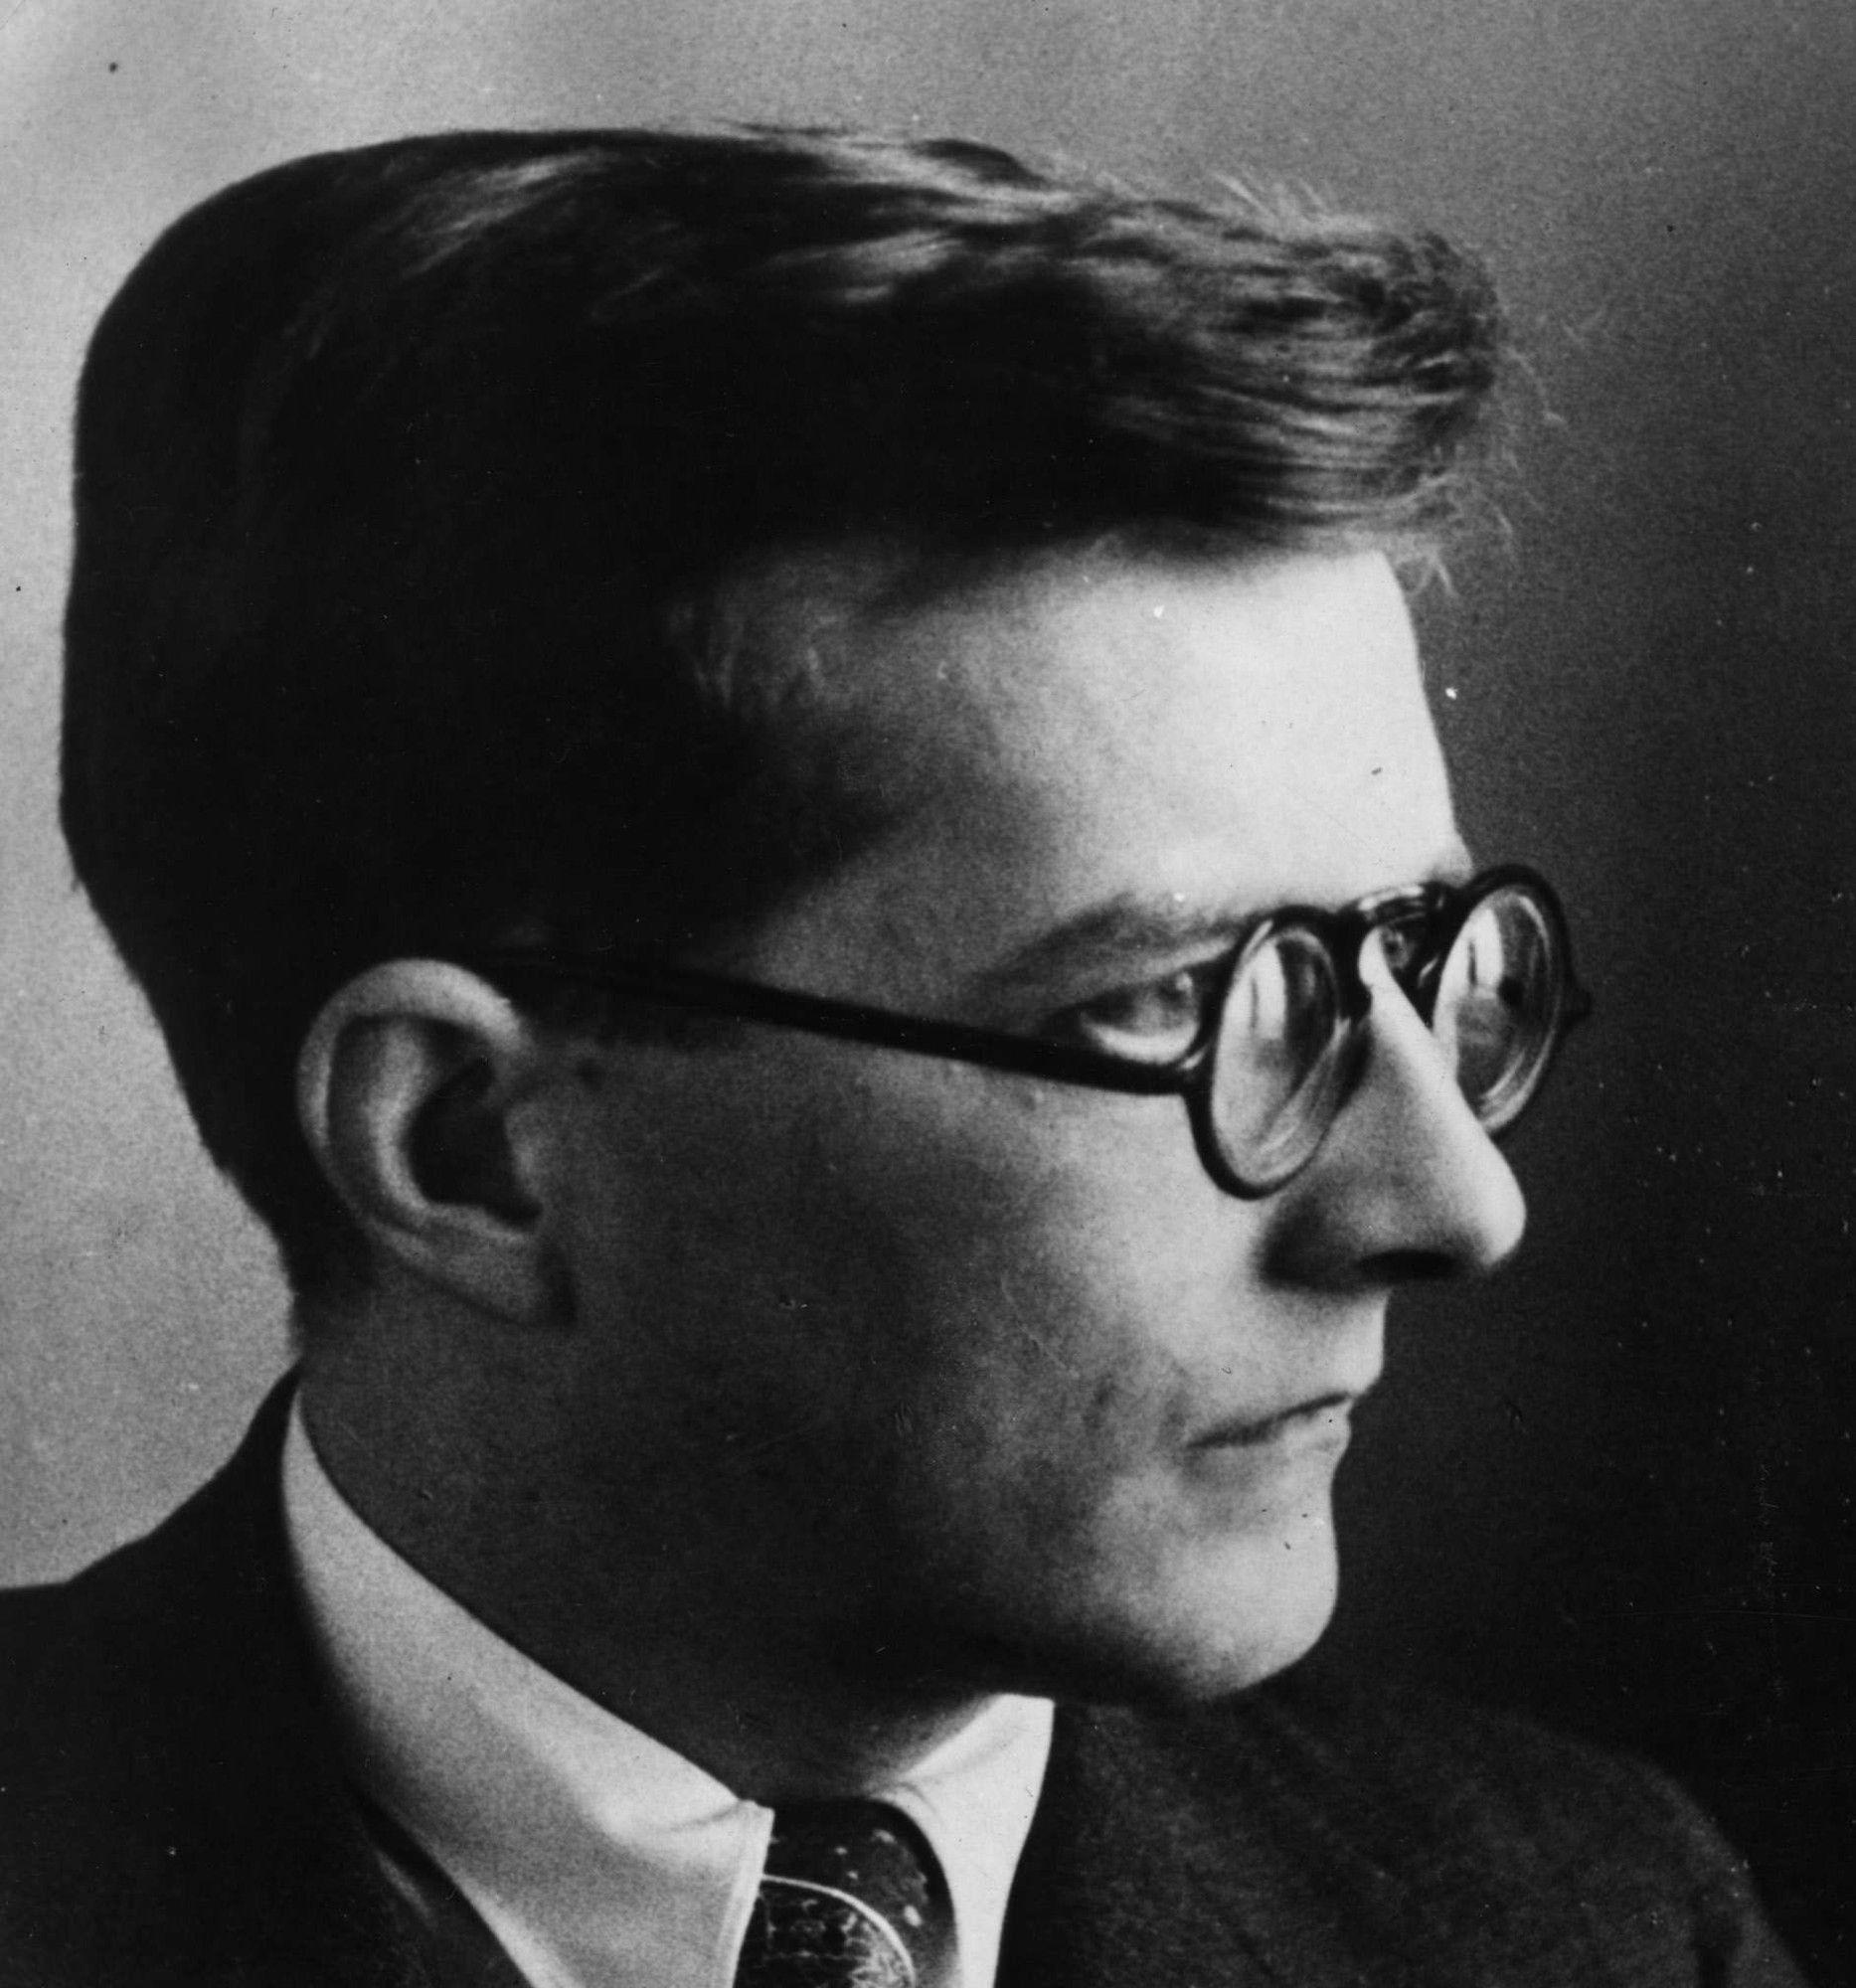 Shostakovich Maxim Dmitrievich: biography, creativity